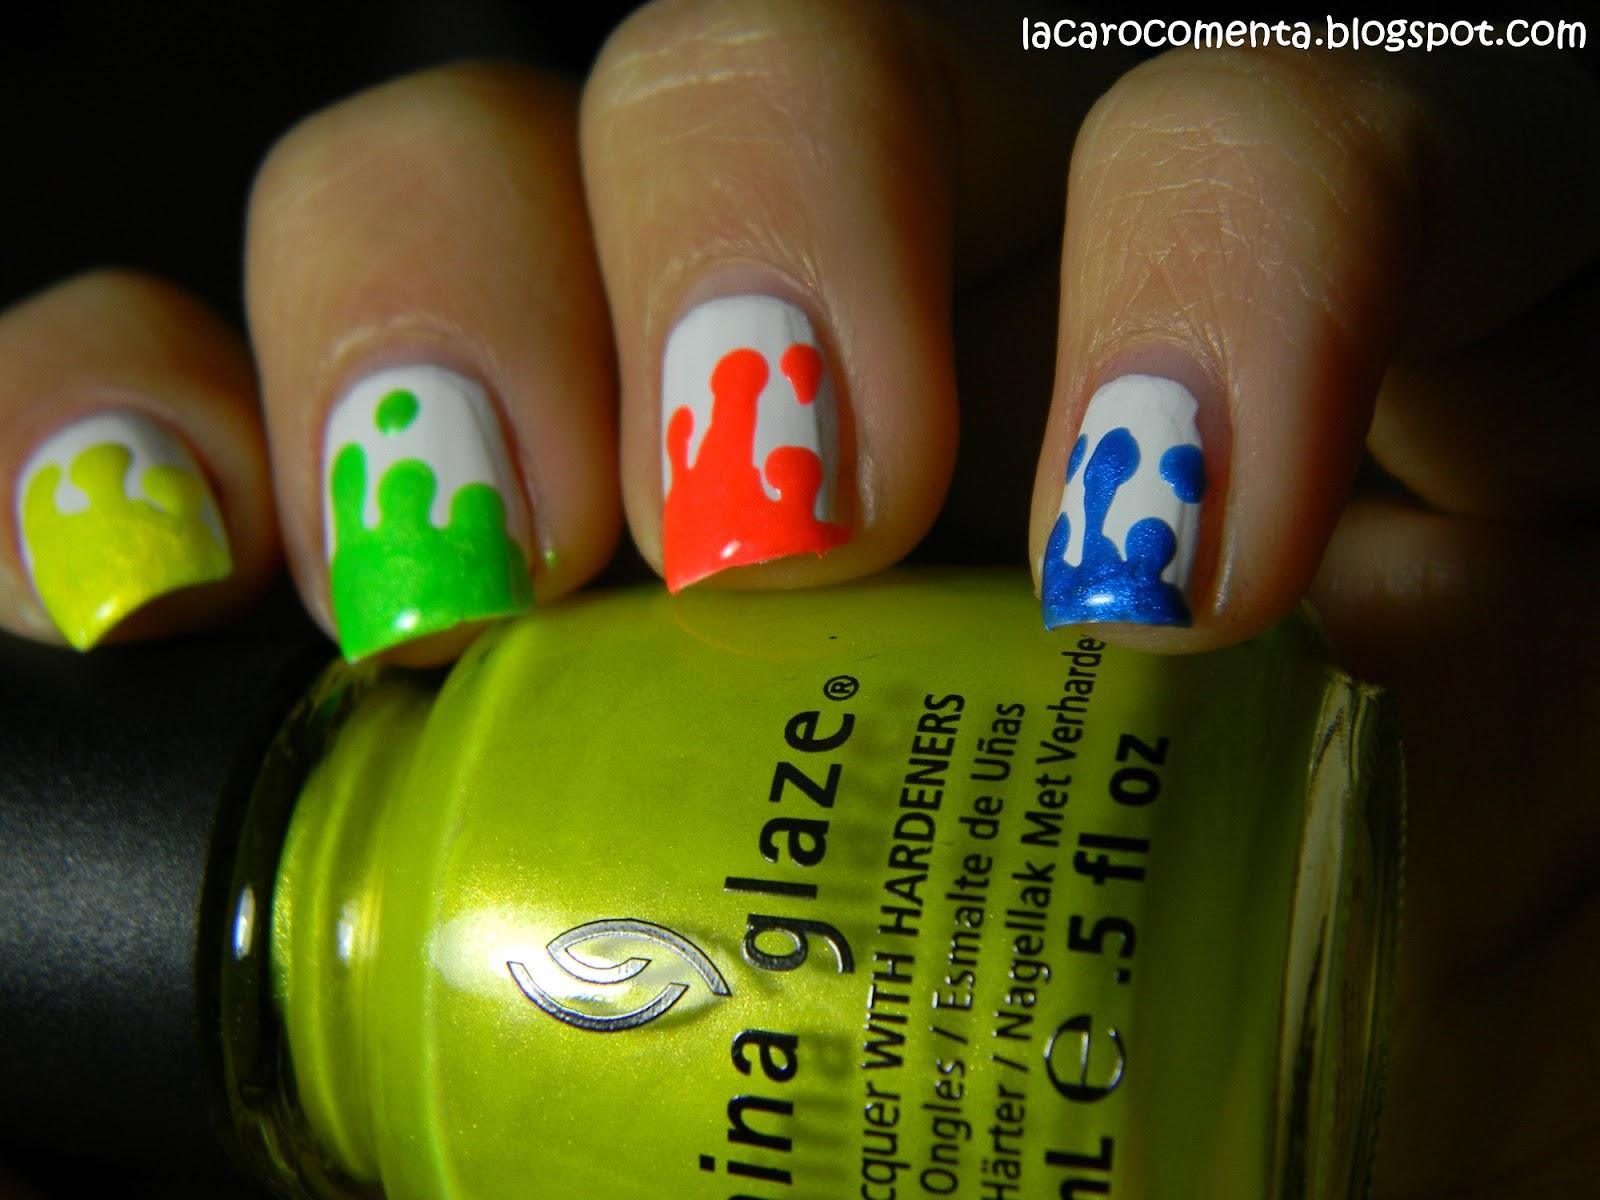 La Caro comenta: Tutorial: Dripping nails o Uñas que gotean